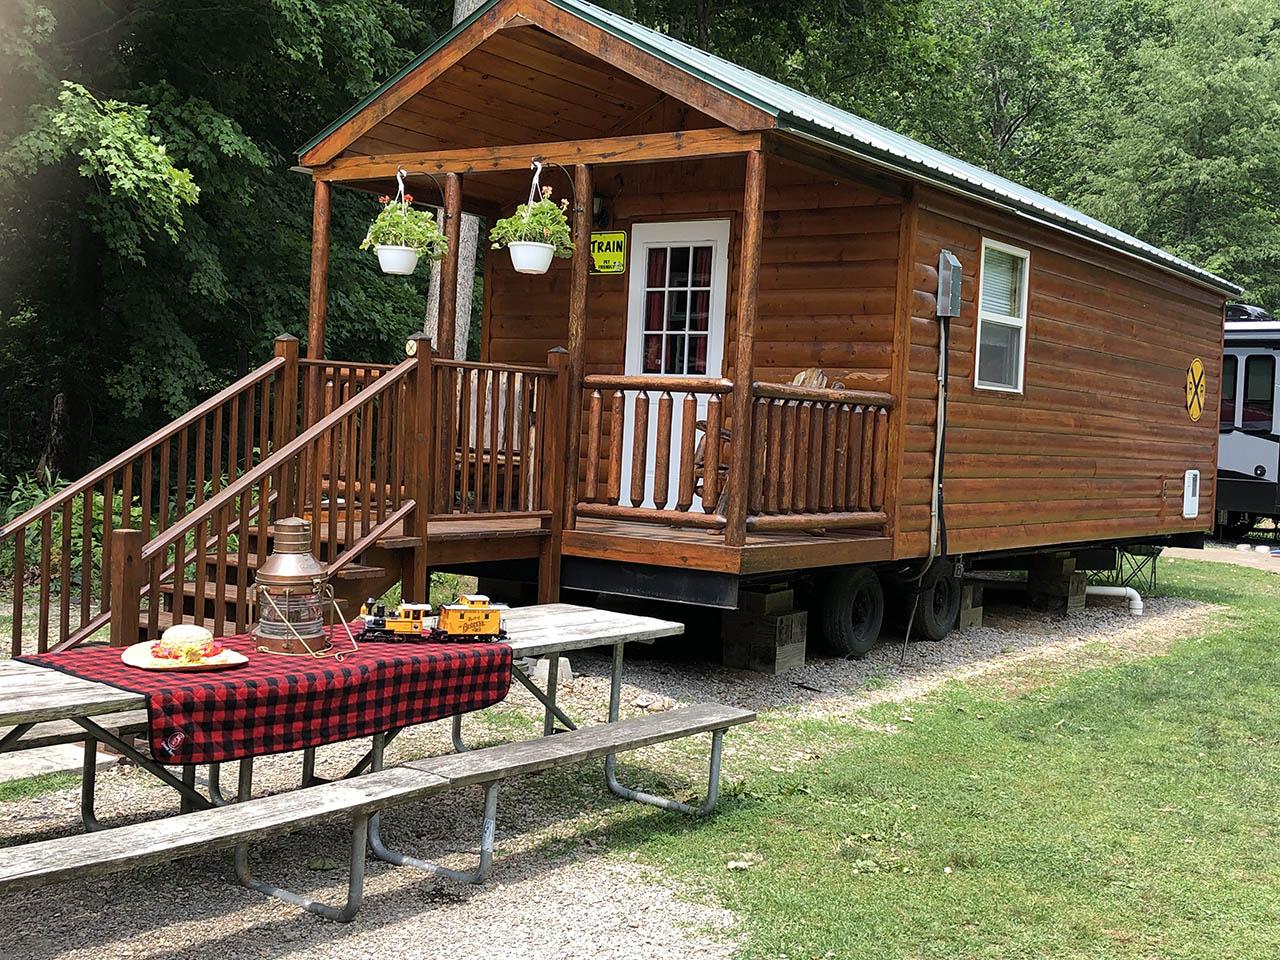 exterior train cabin